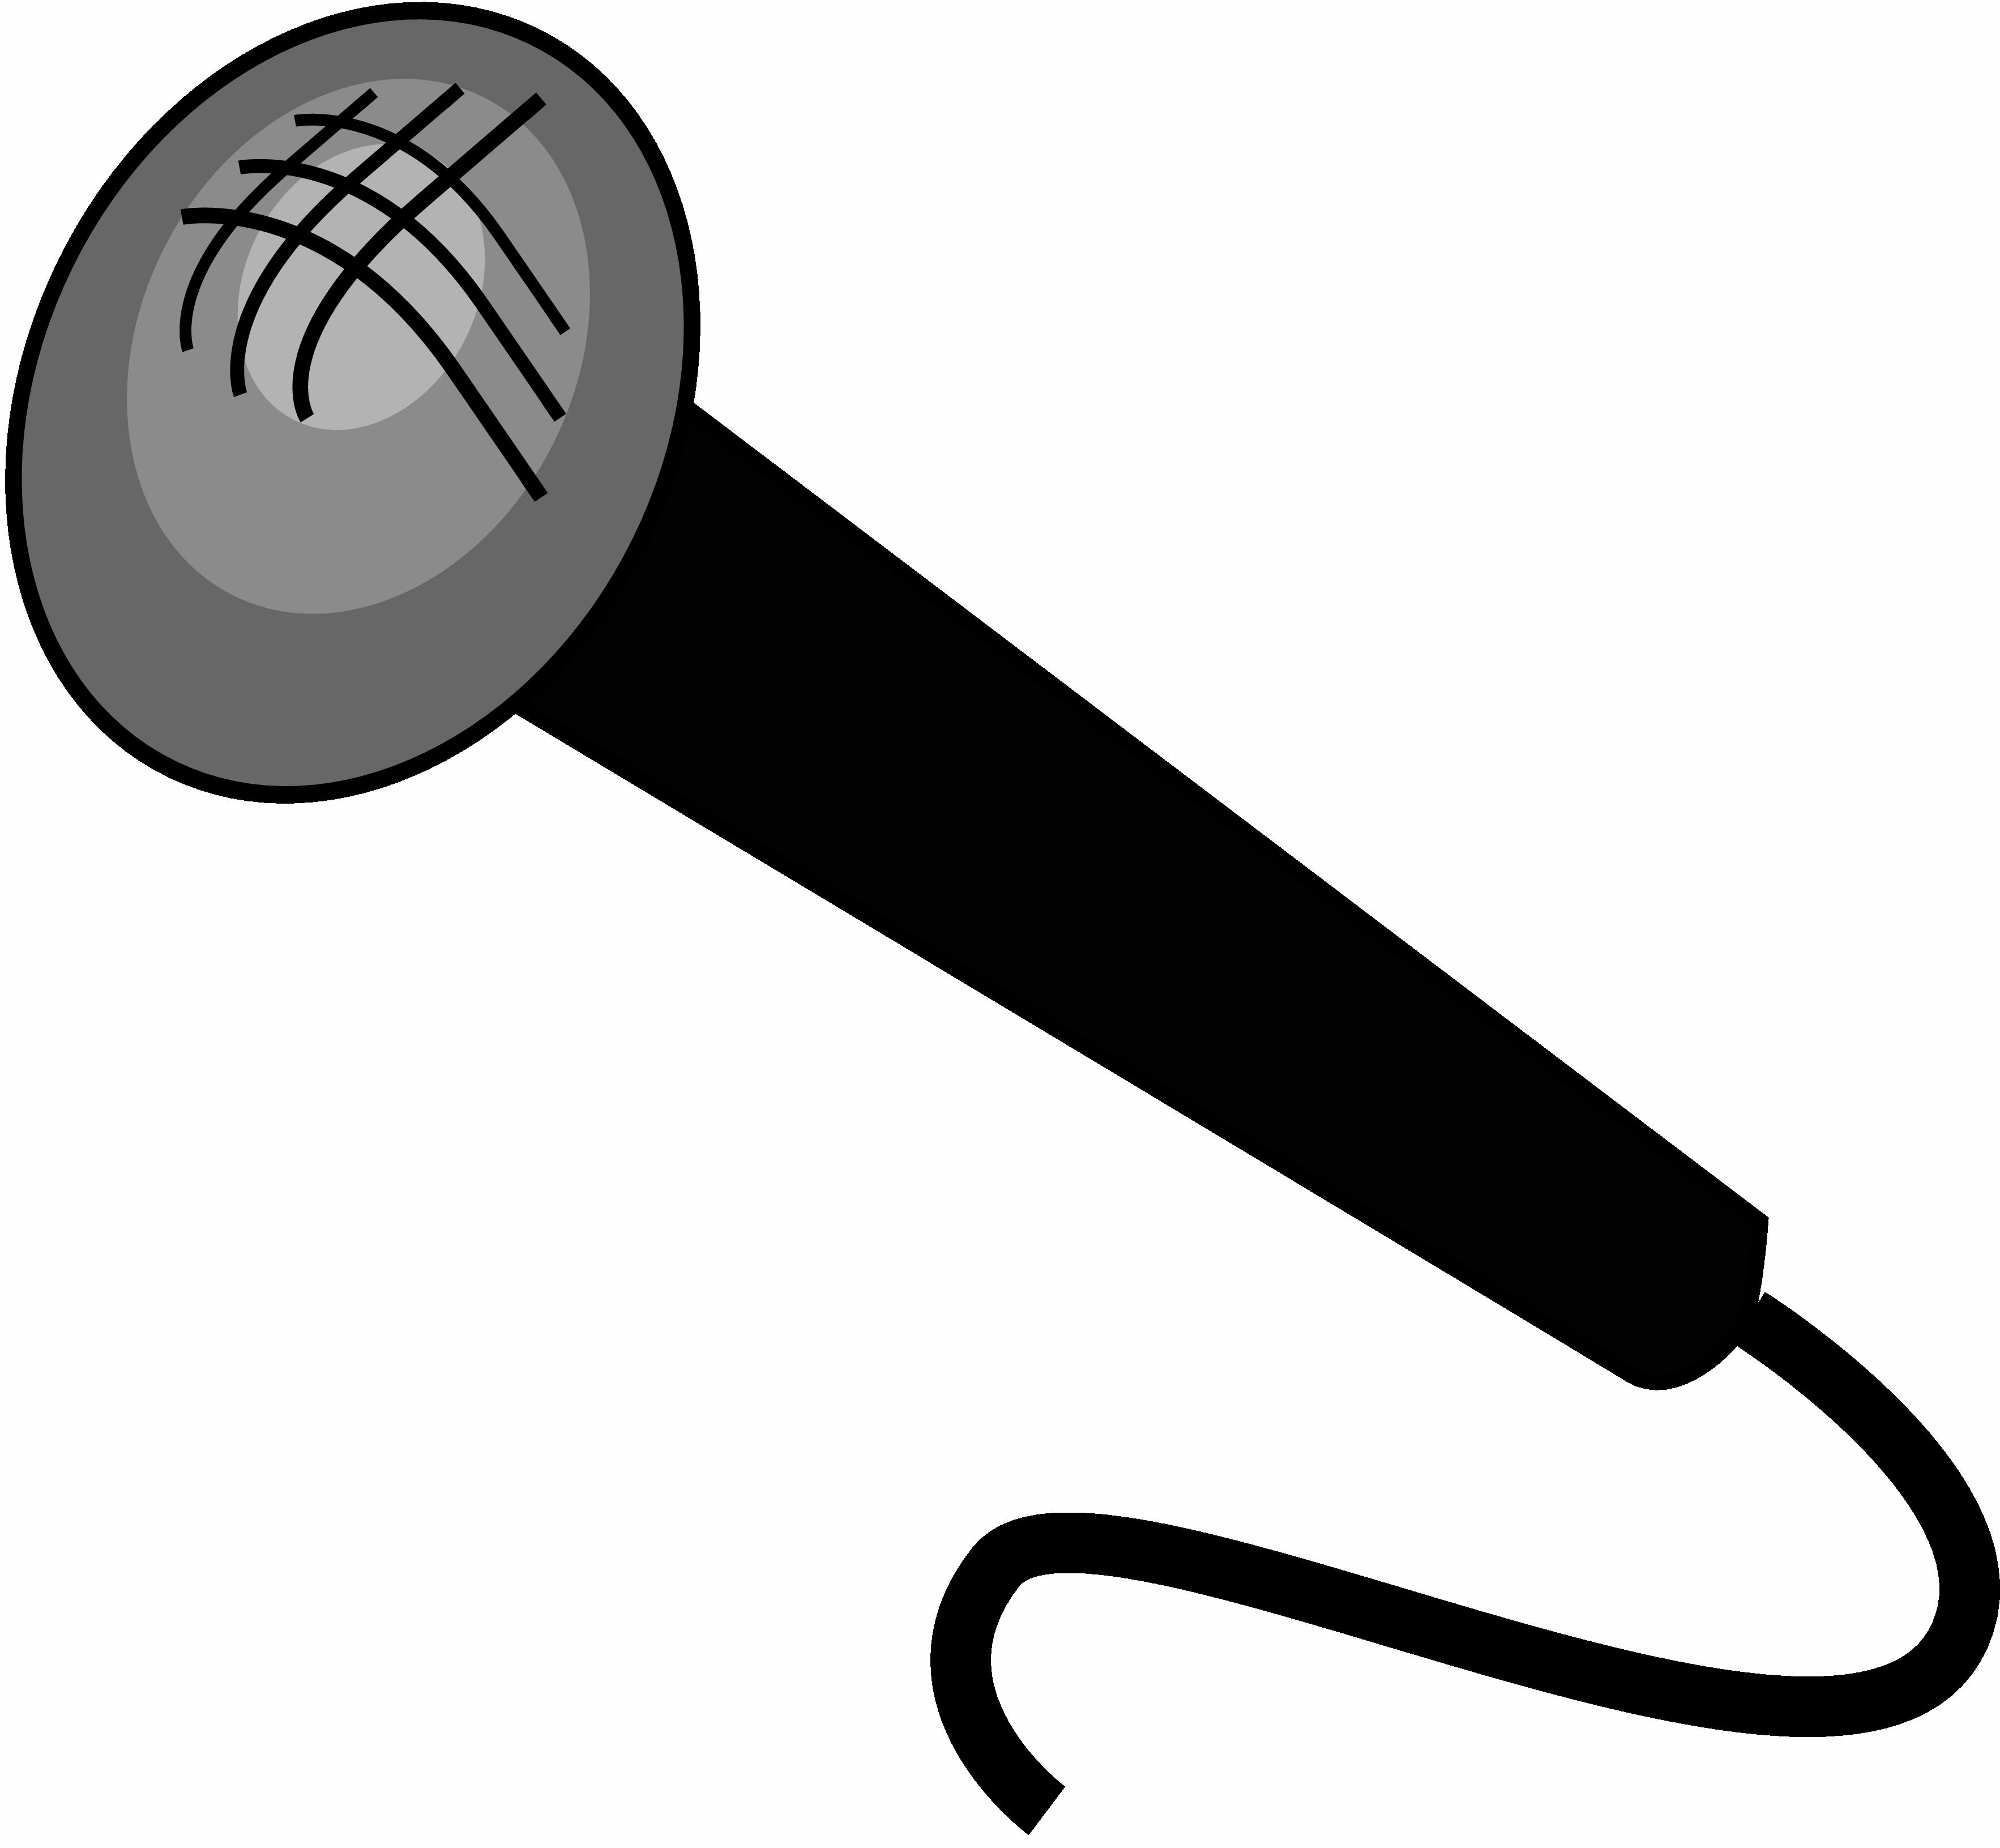 Free Microphone Clip Art, Download Free Clip Art, Free Clip.